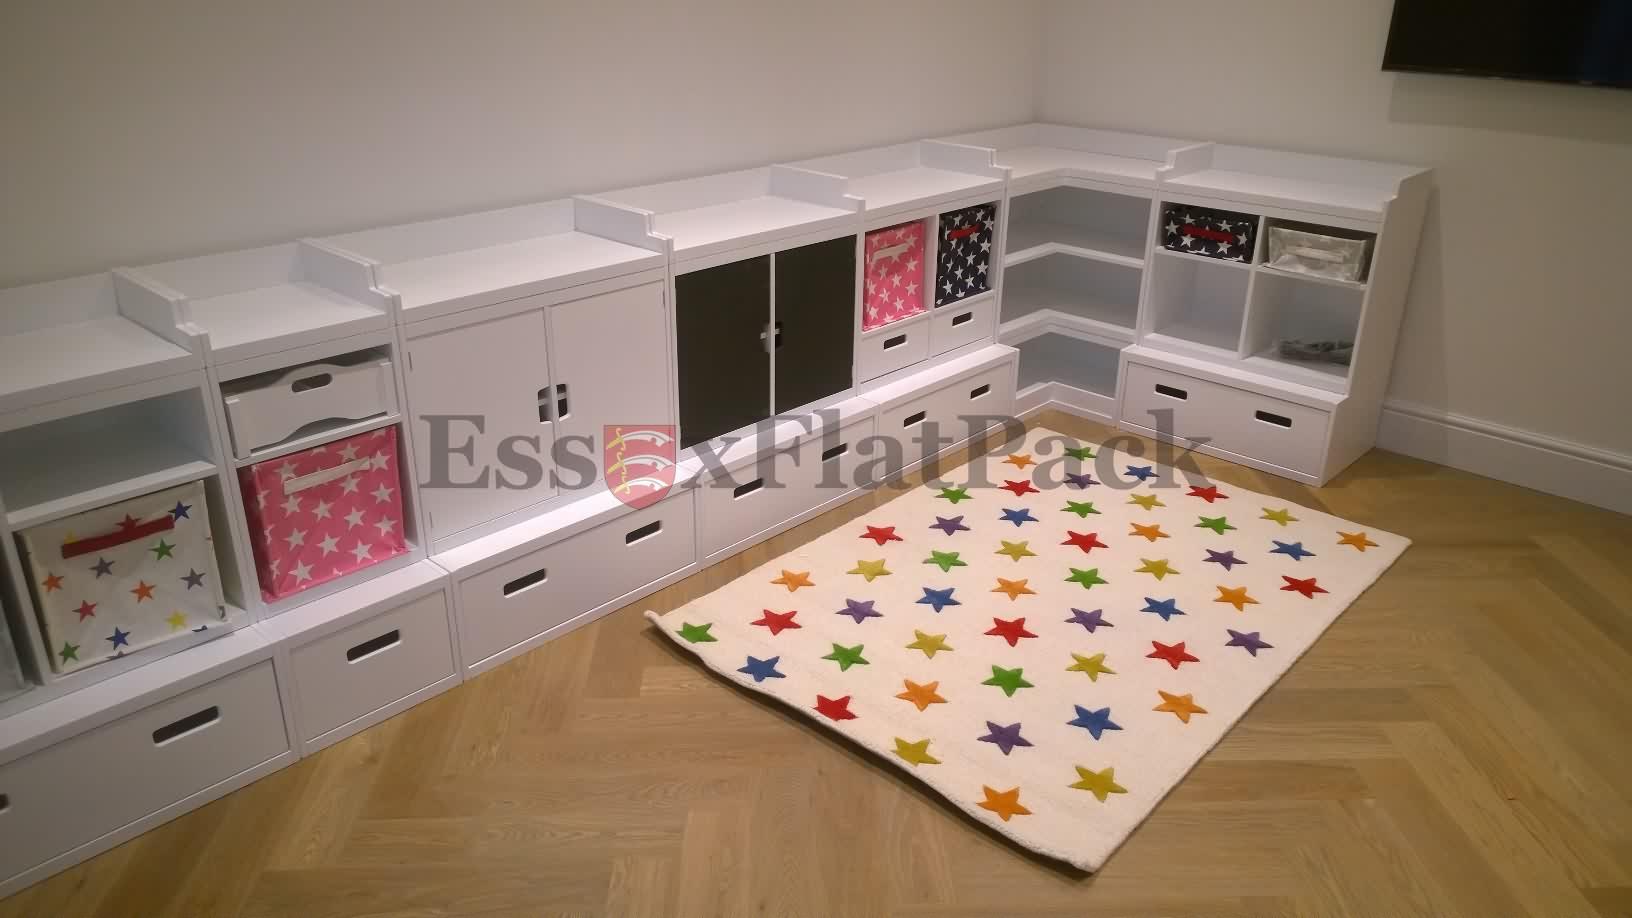 essexflatpack-furniture-20151118151814.jpg